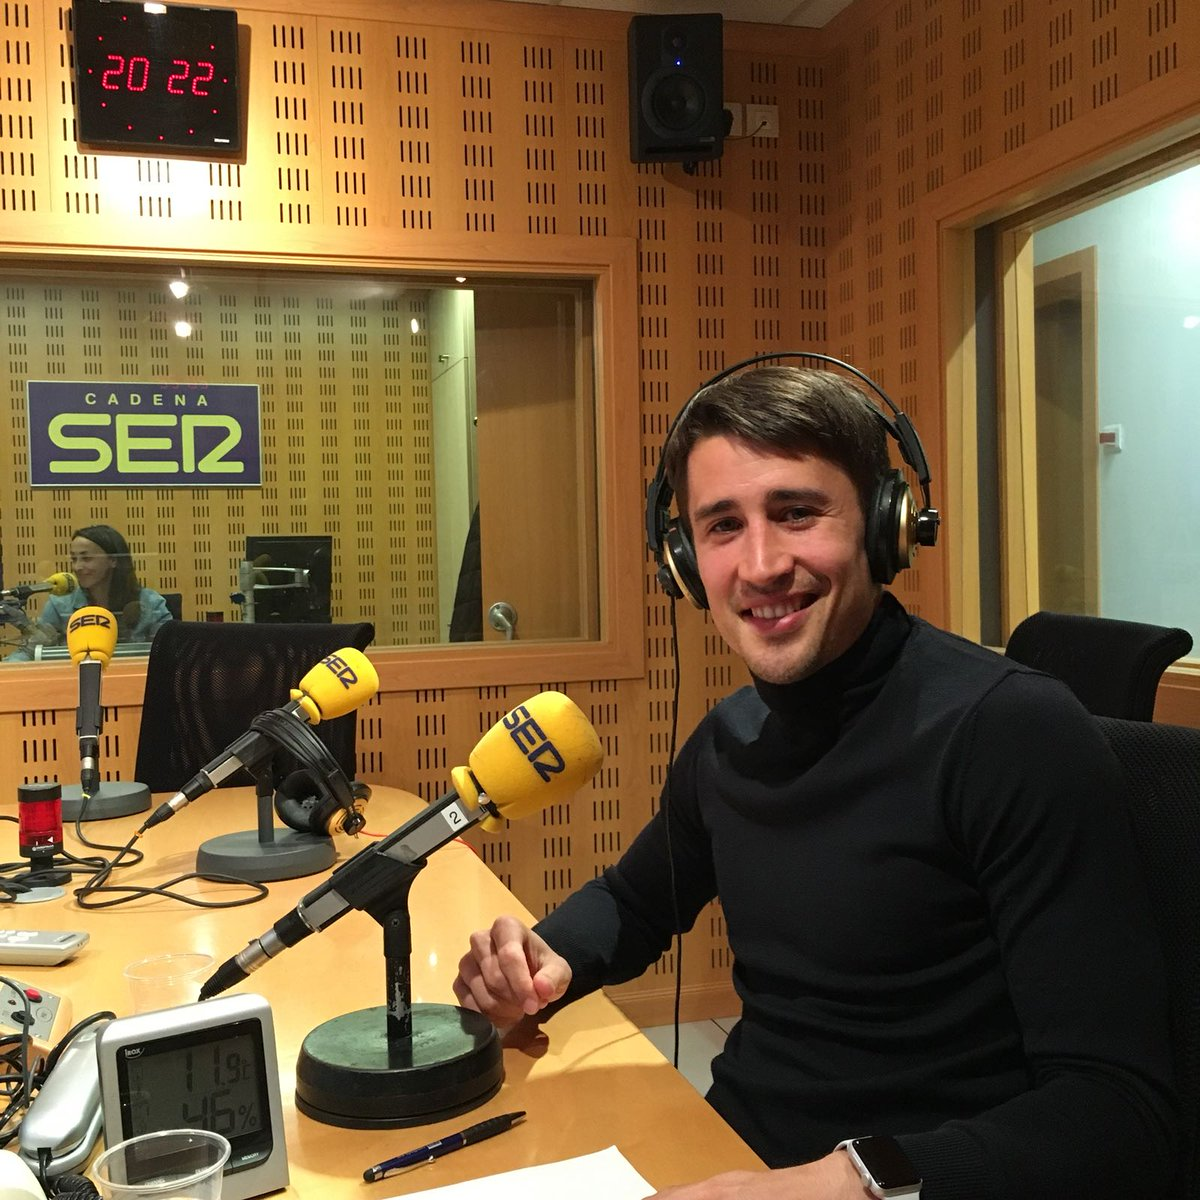 Bojan Krkic in guest commentator appearance for Barça v Roma clash on Carrusel Deportivo